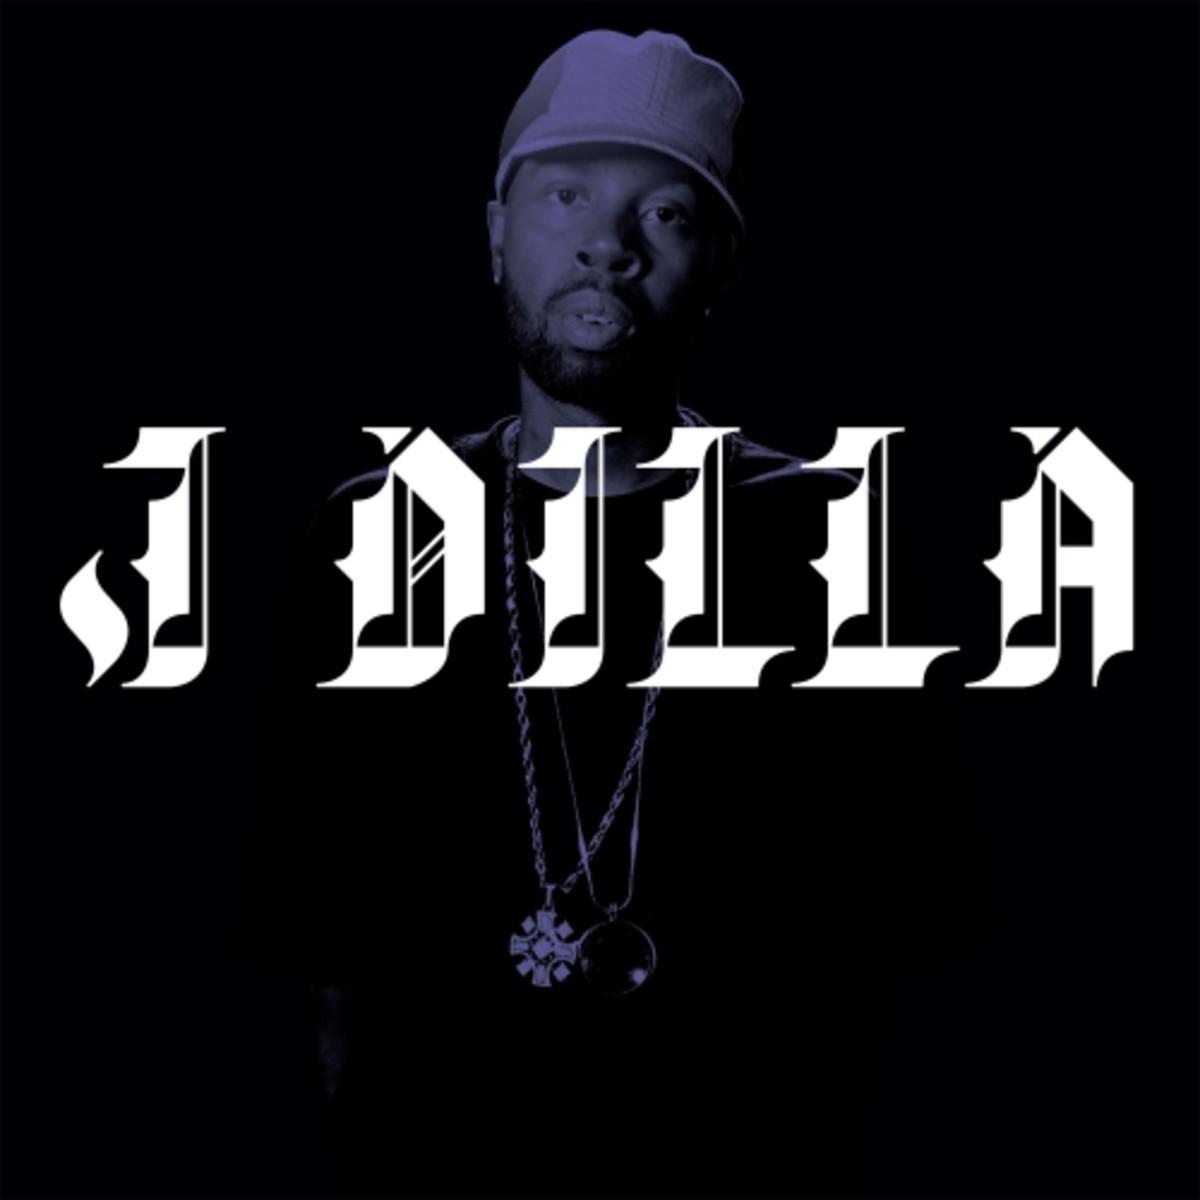 j-dilla-the-diary.jpg